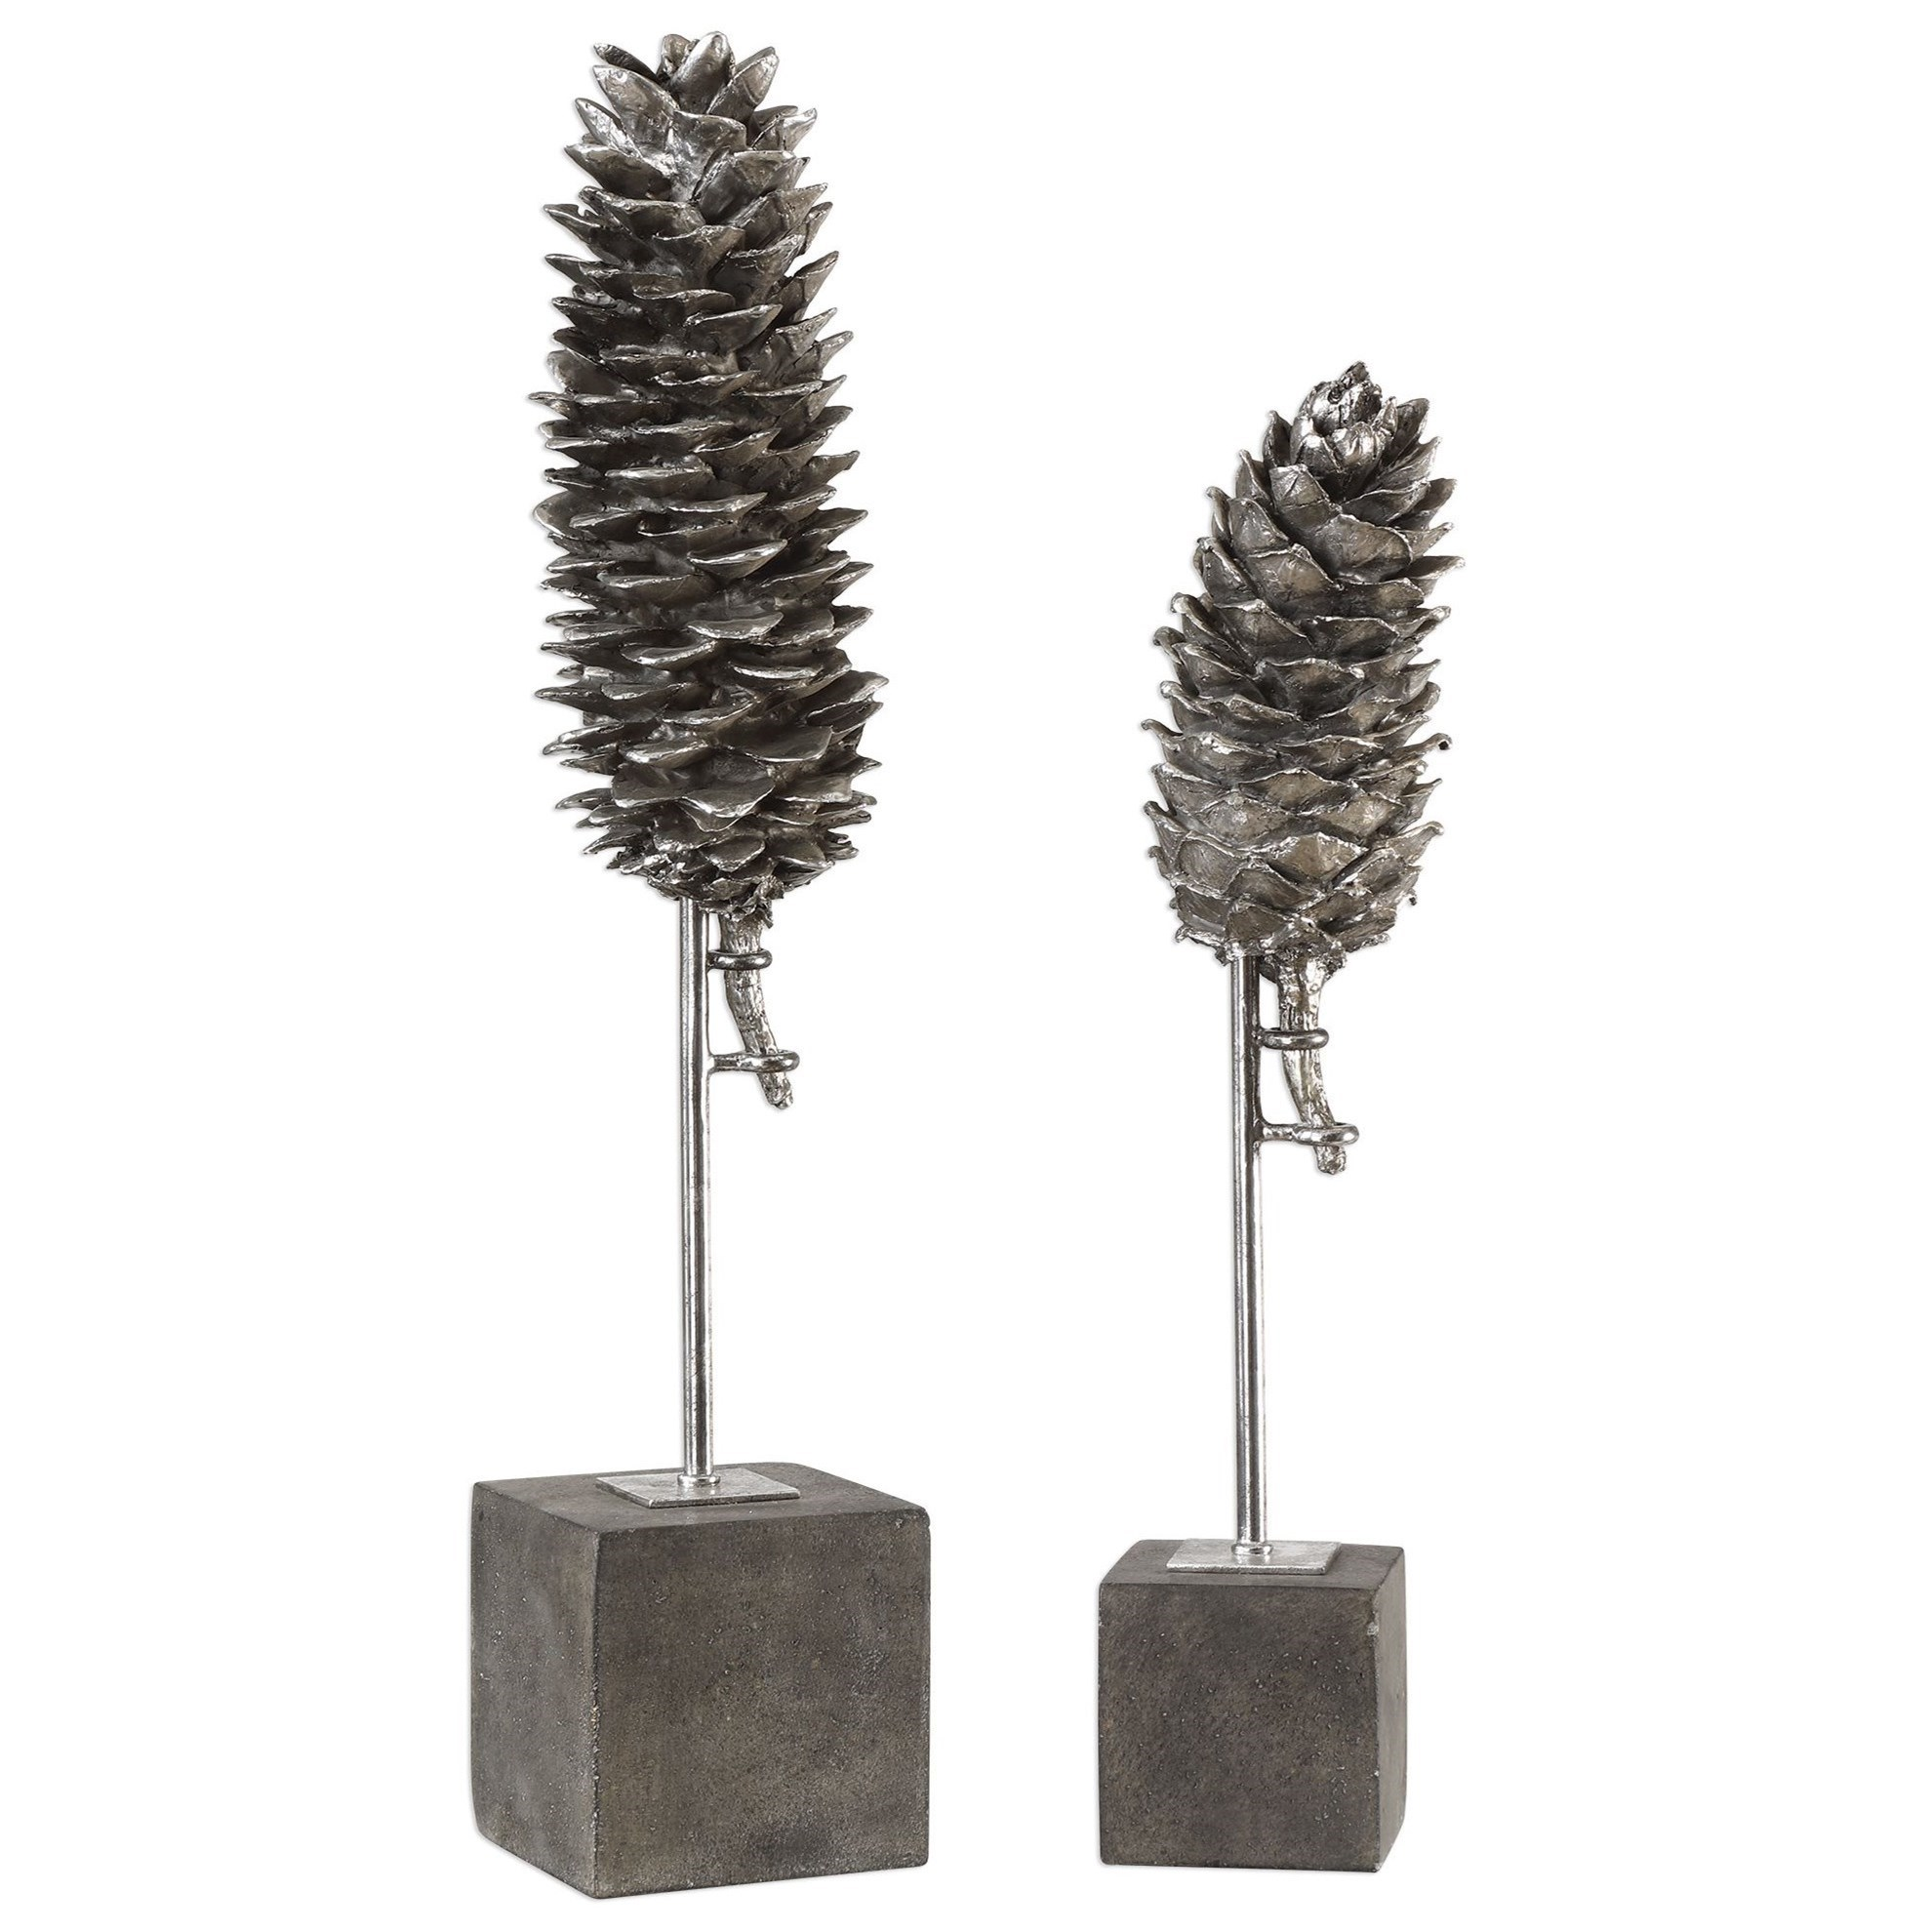 Longleaf Pine Cone Sculptures